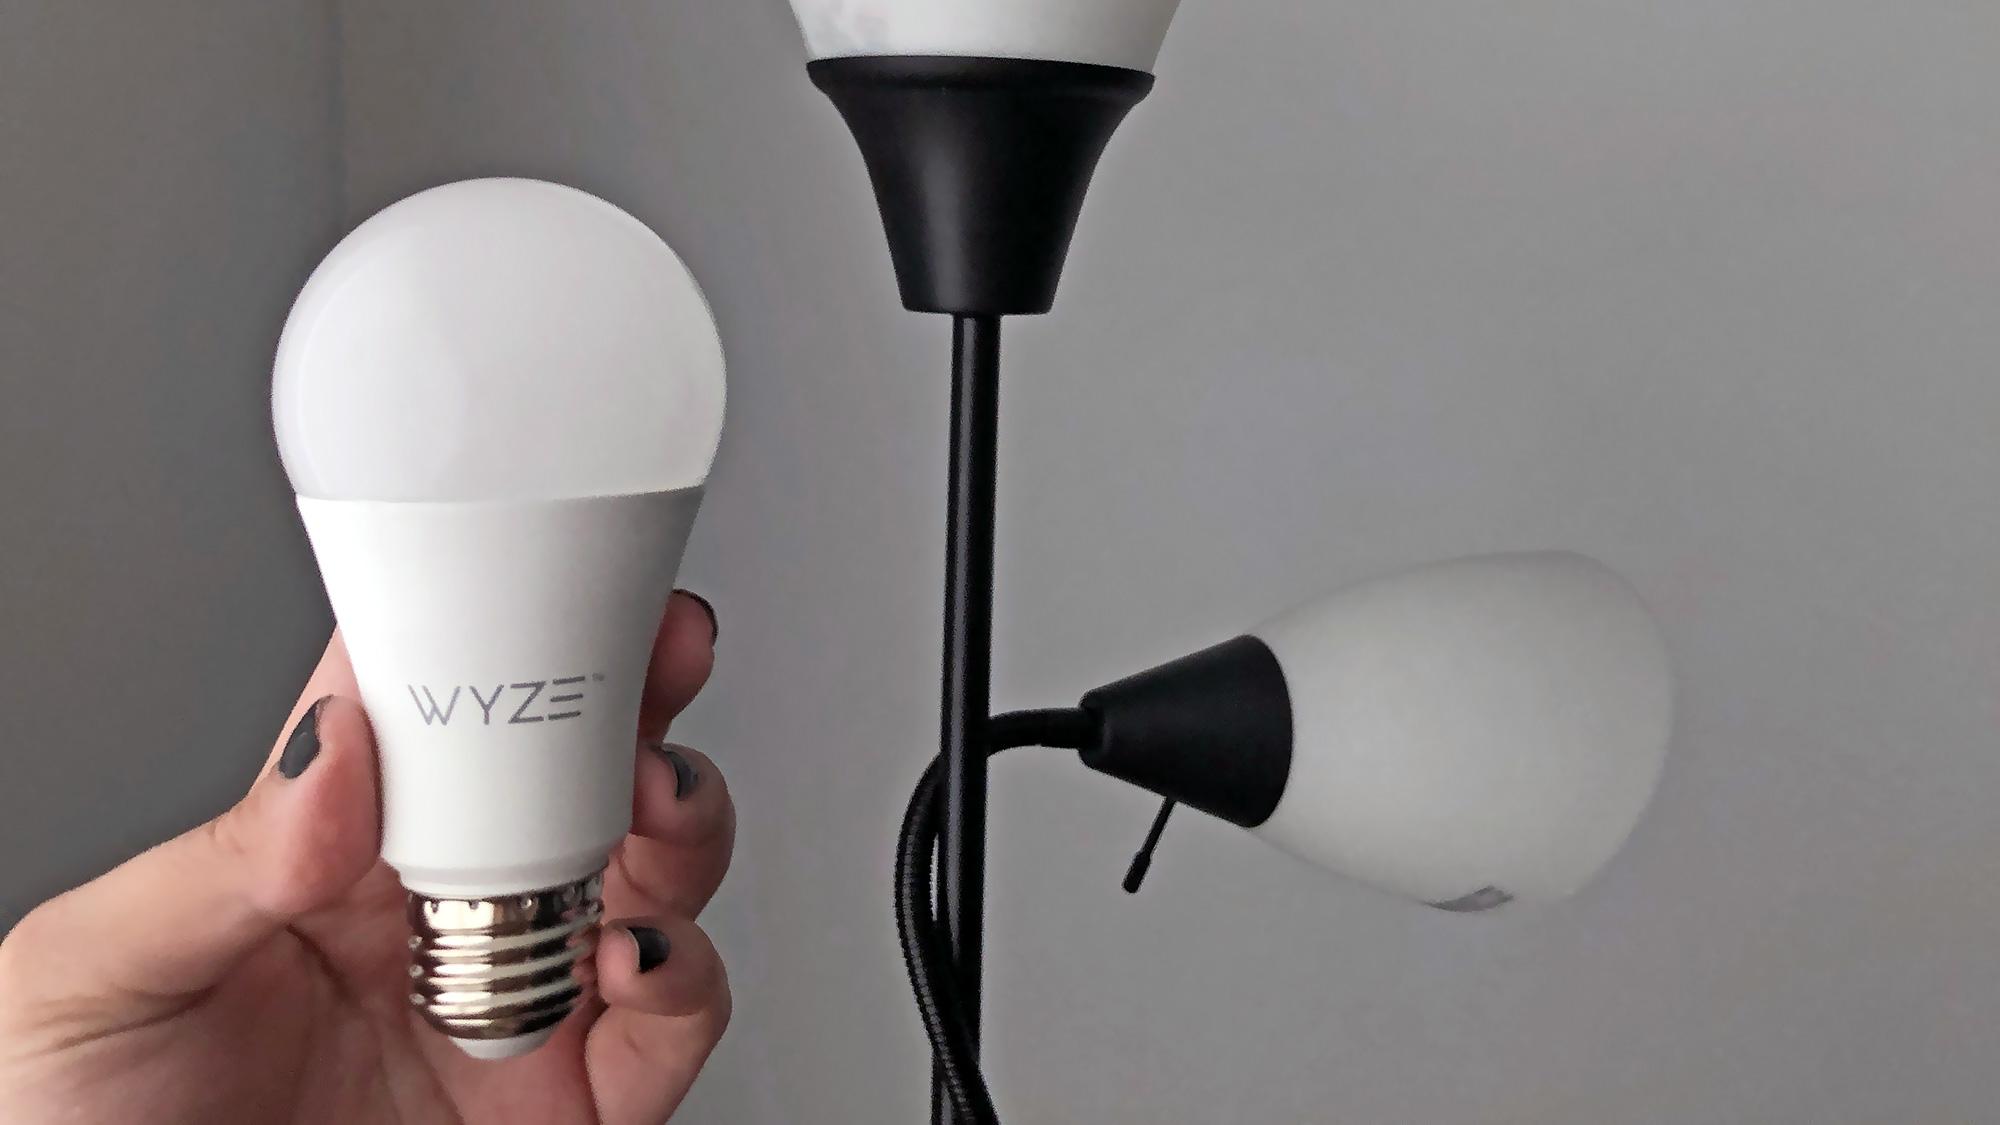 best cheap smart home devices: Wyze Bulb